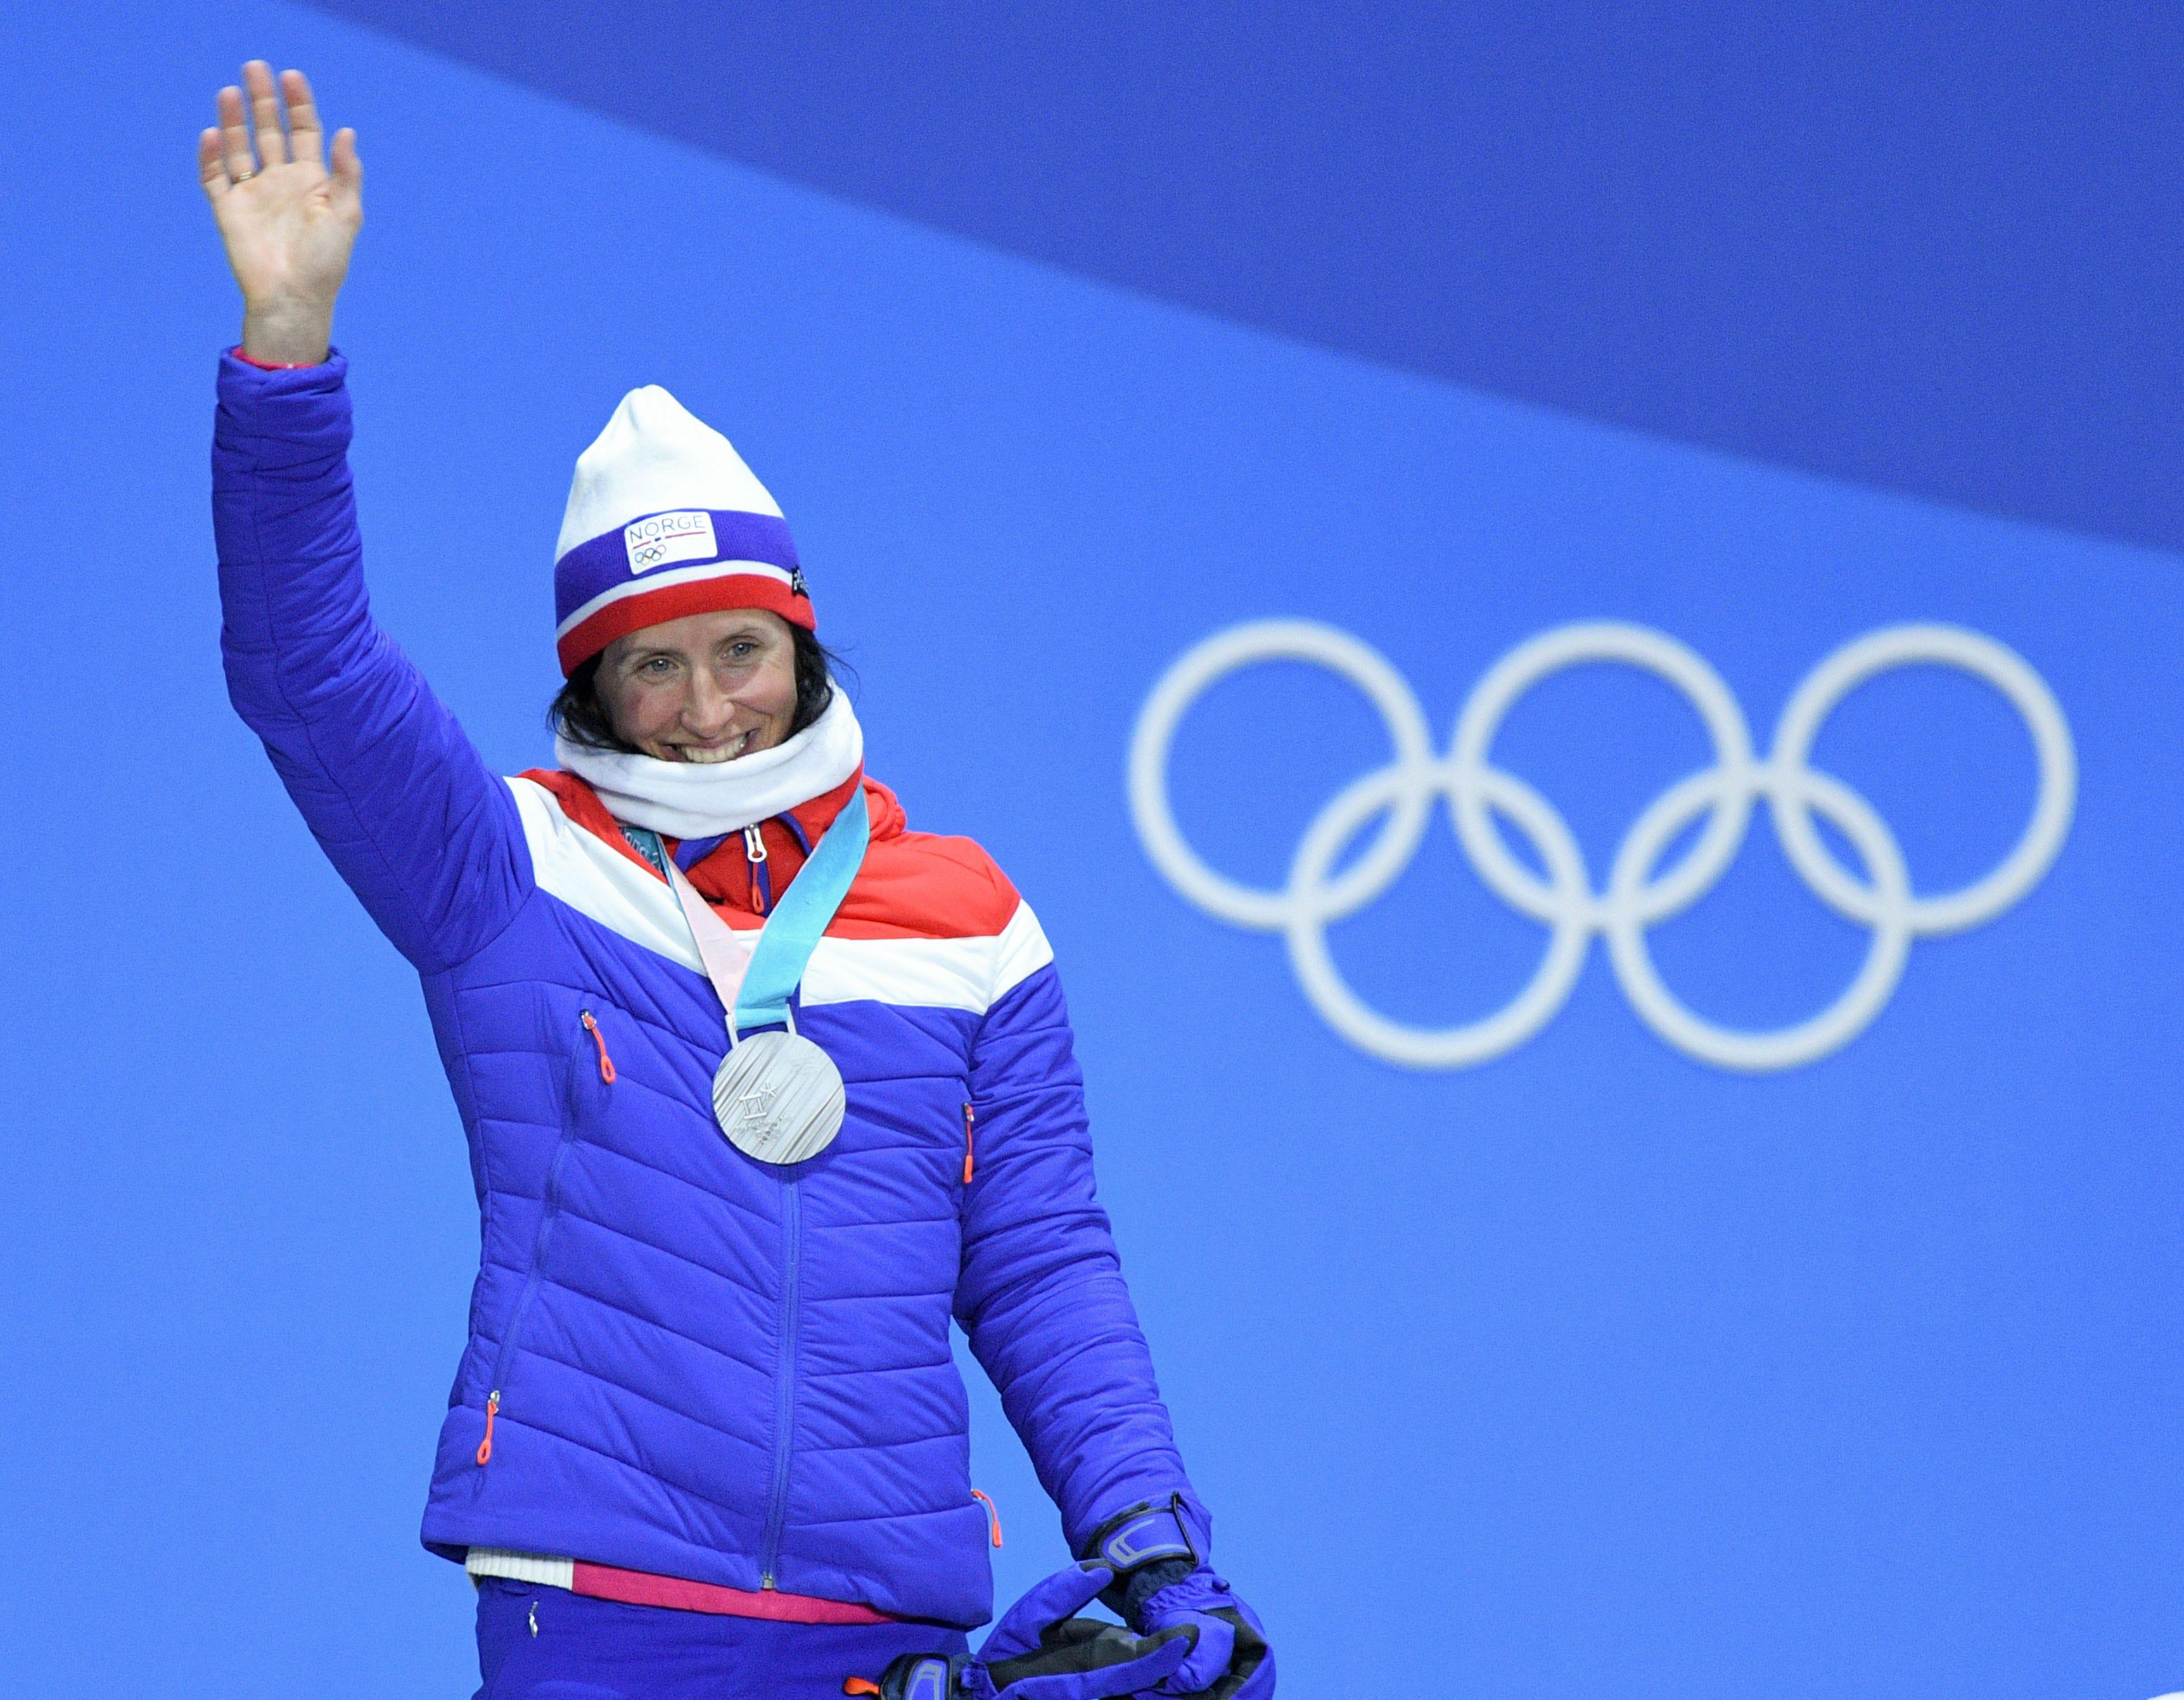 Watch Marit Bjorgen 10 Olympic medals video